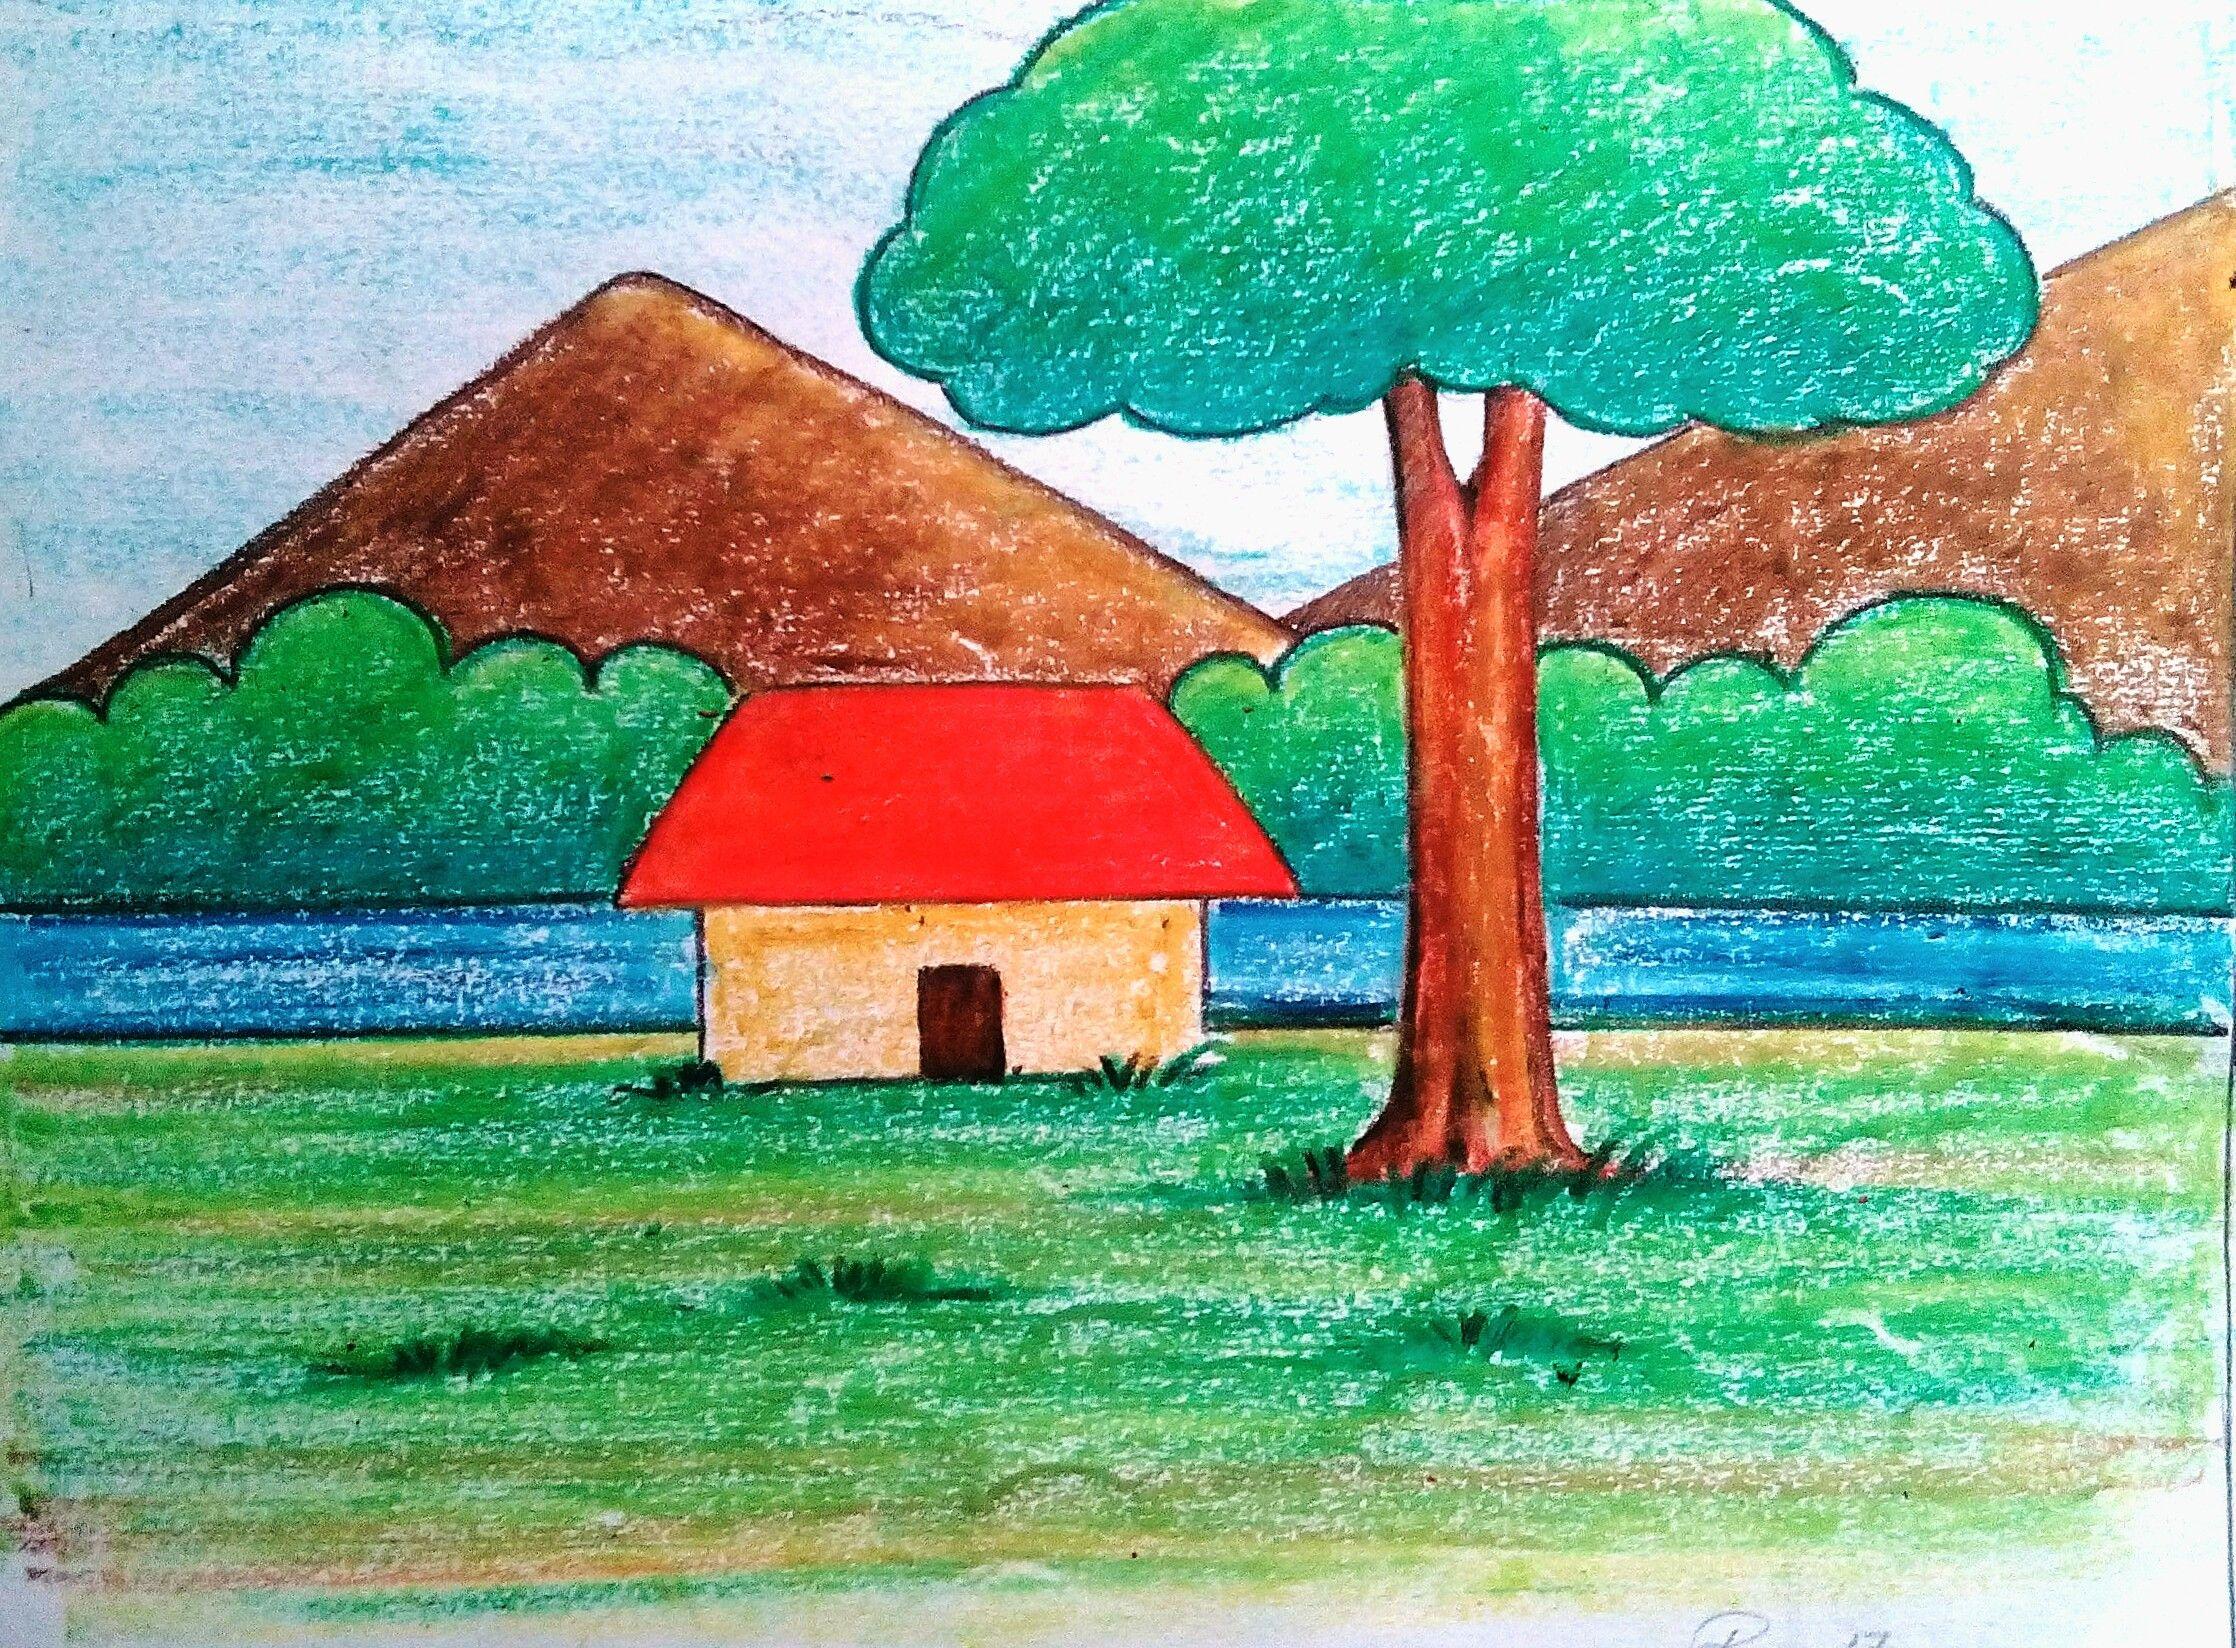 Easy Scenery drawing | Easy scenery drawing, Scenery ...